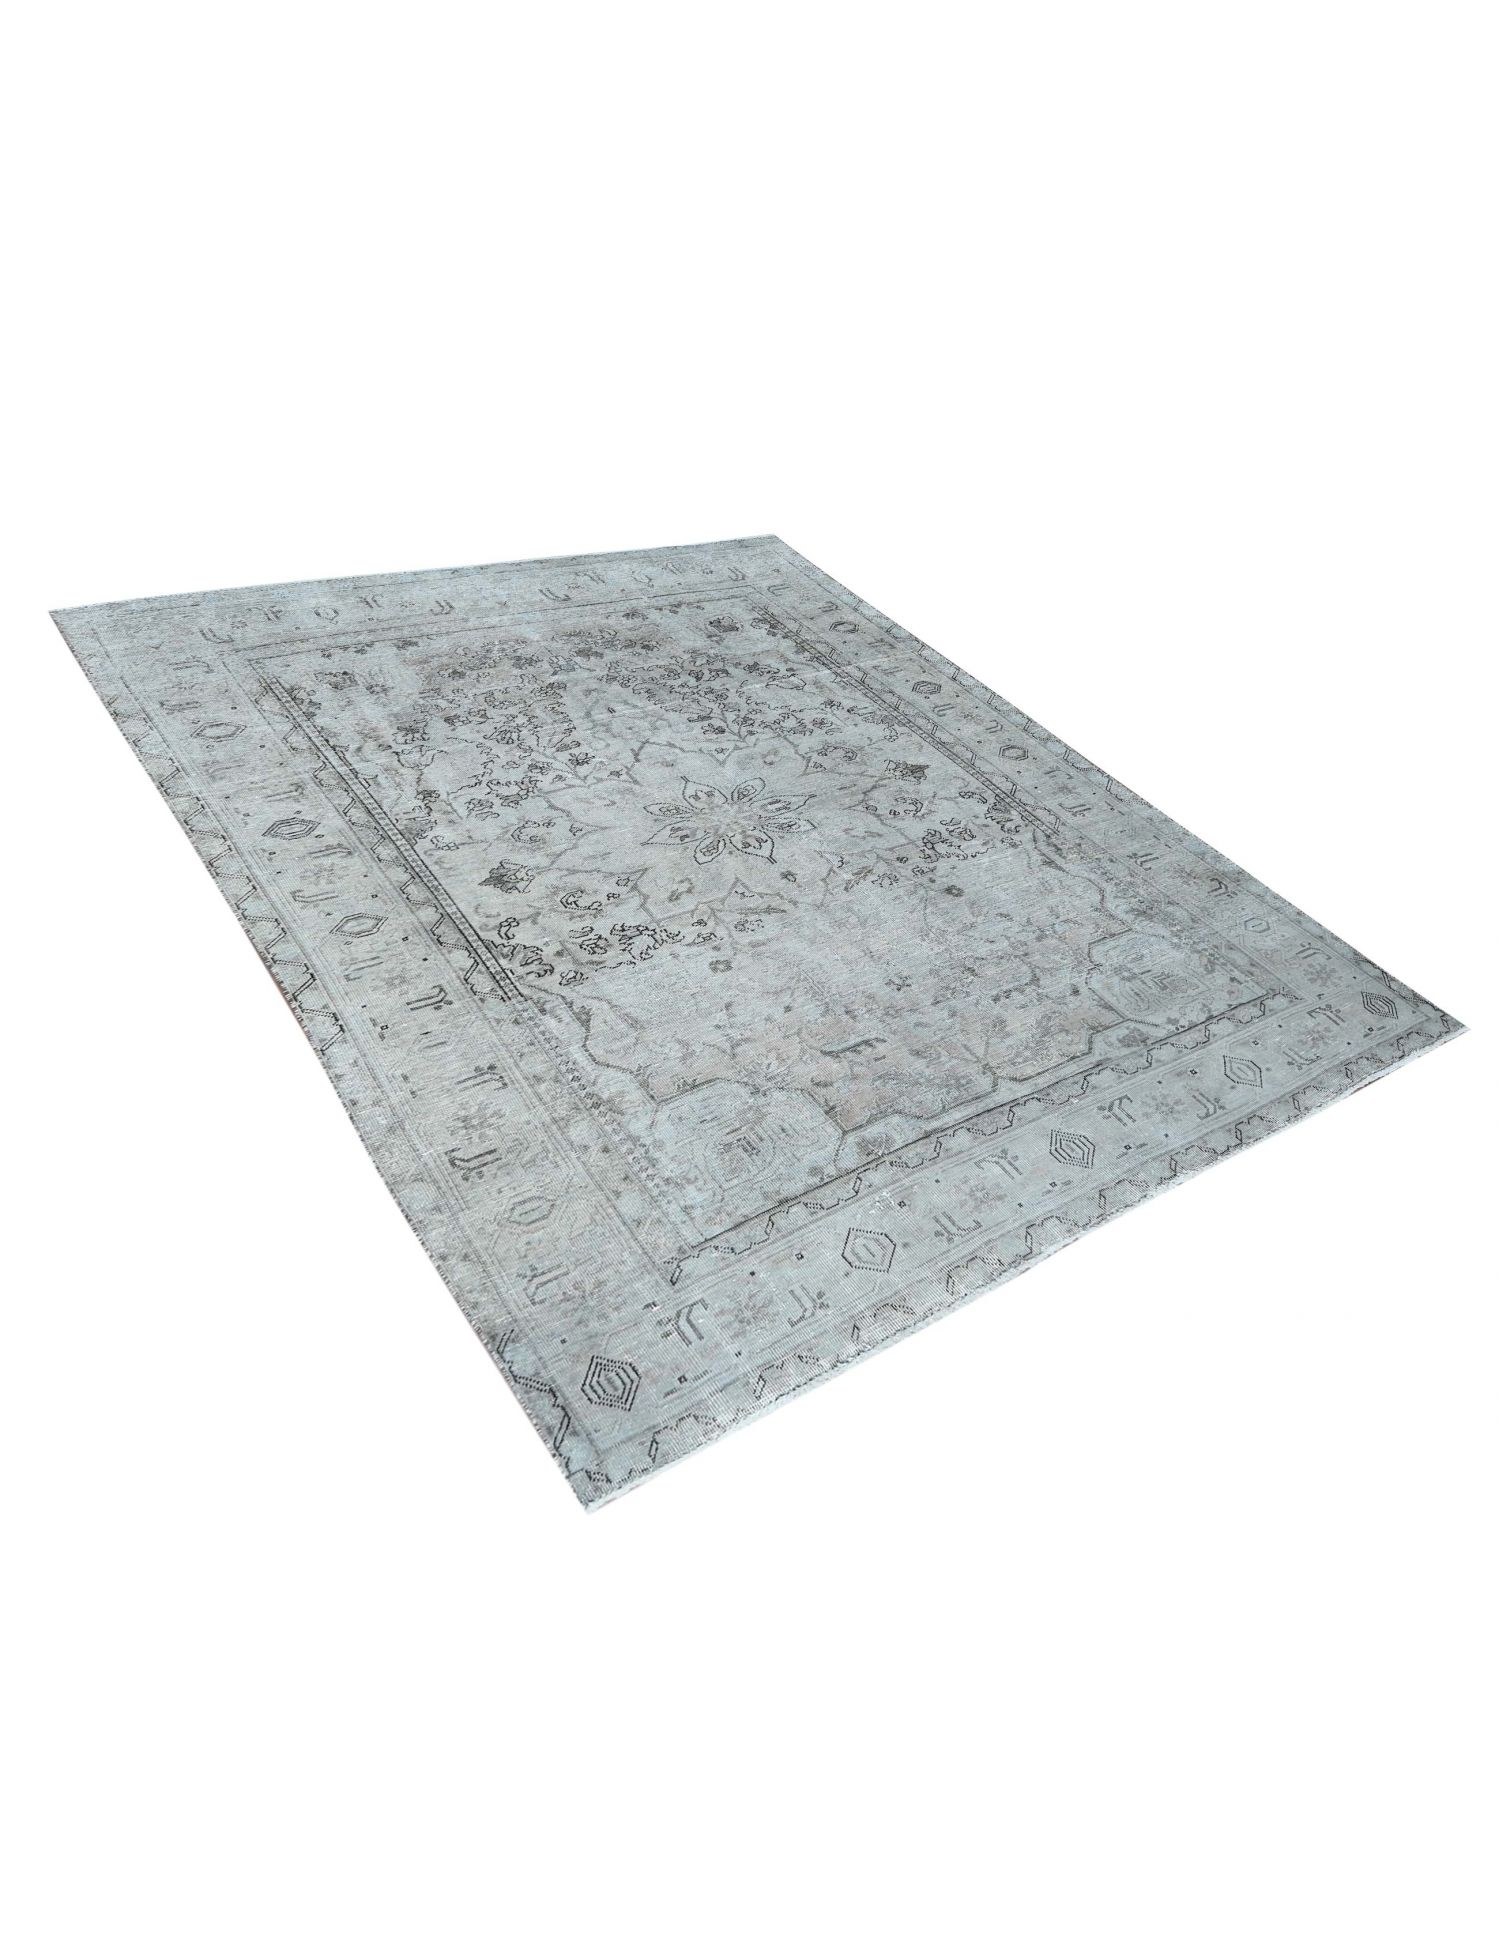 Vintage Teppich  grau <br/>281 x 224 cm